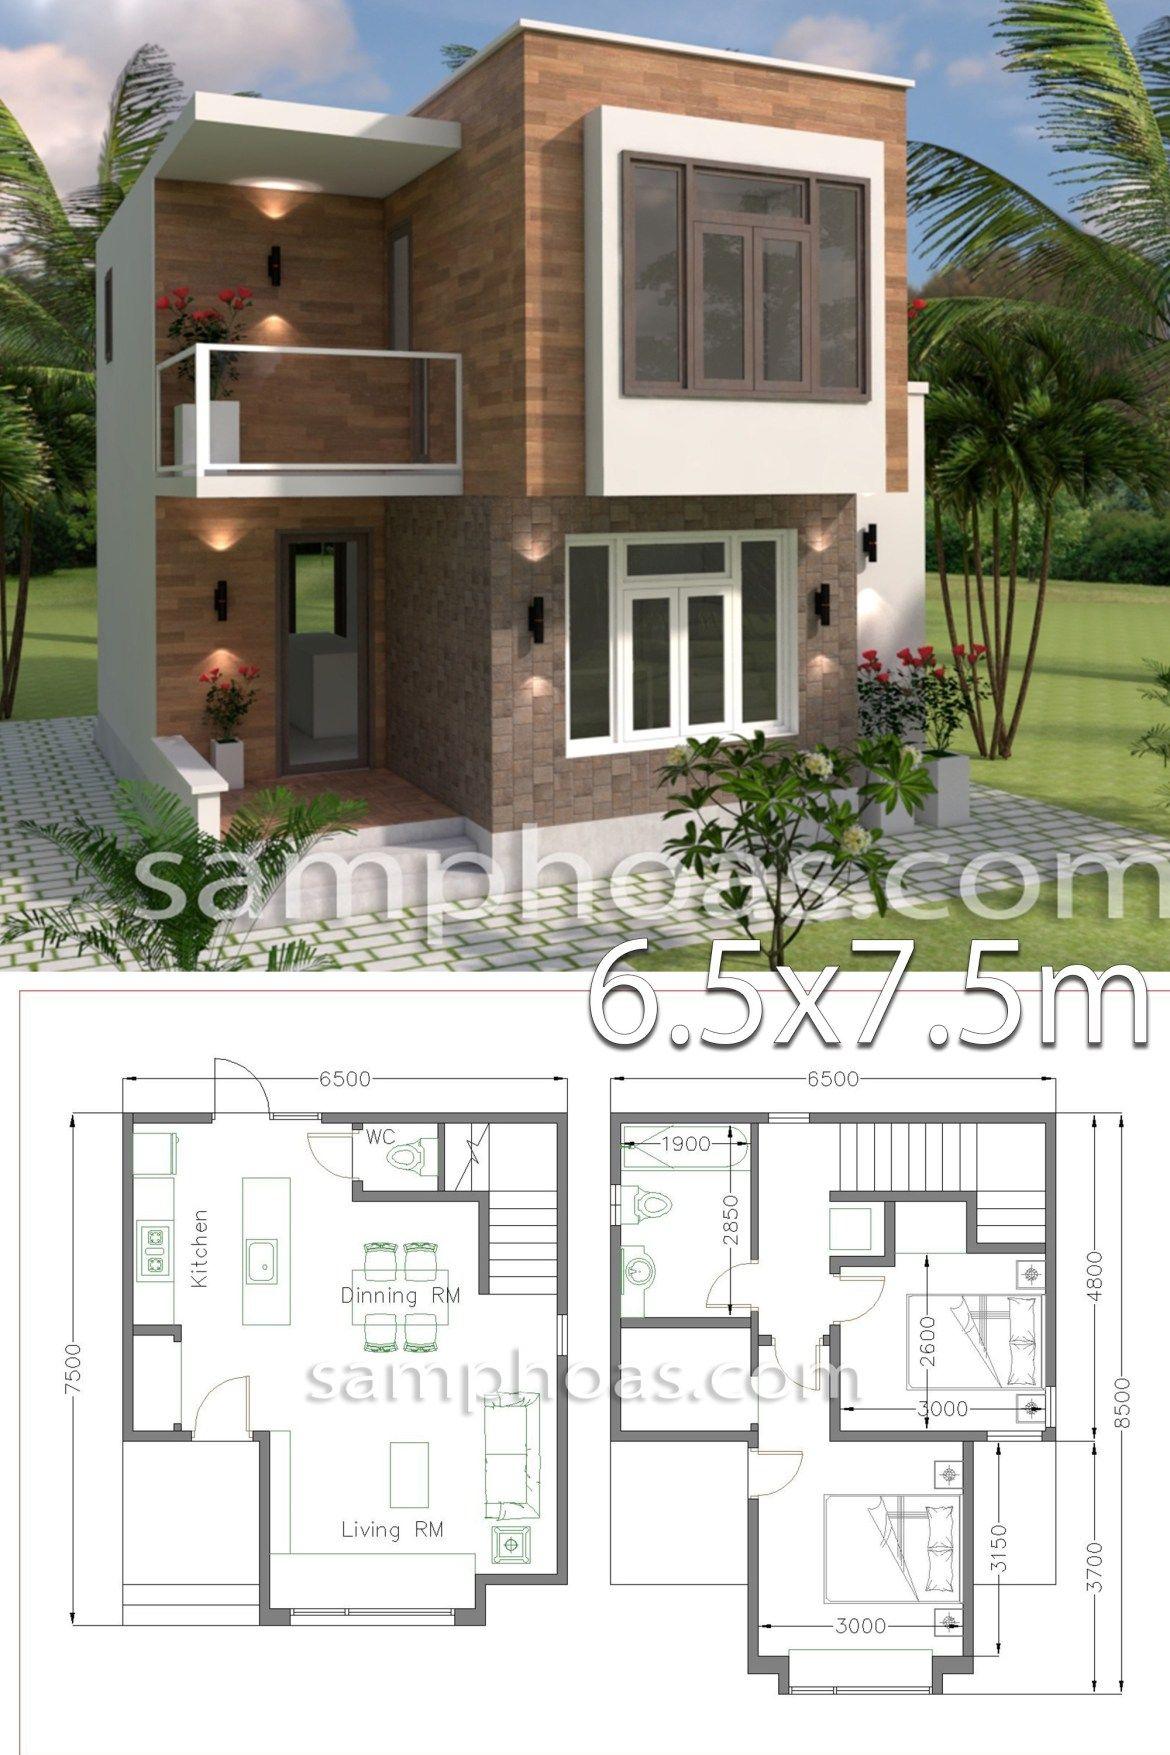 Small House Design With Full Plan 6 5x7 5m 2 Bedrooms Projetos De Casas Pequenas Design De Casa Minimalista Plantas De Casas